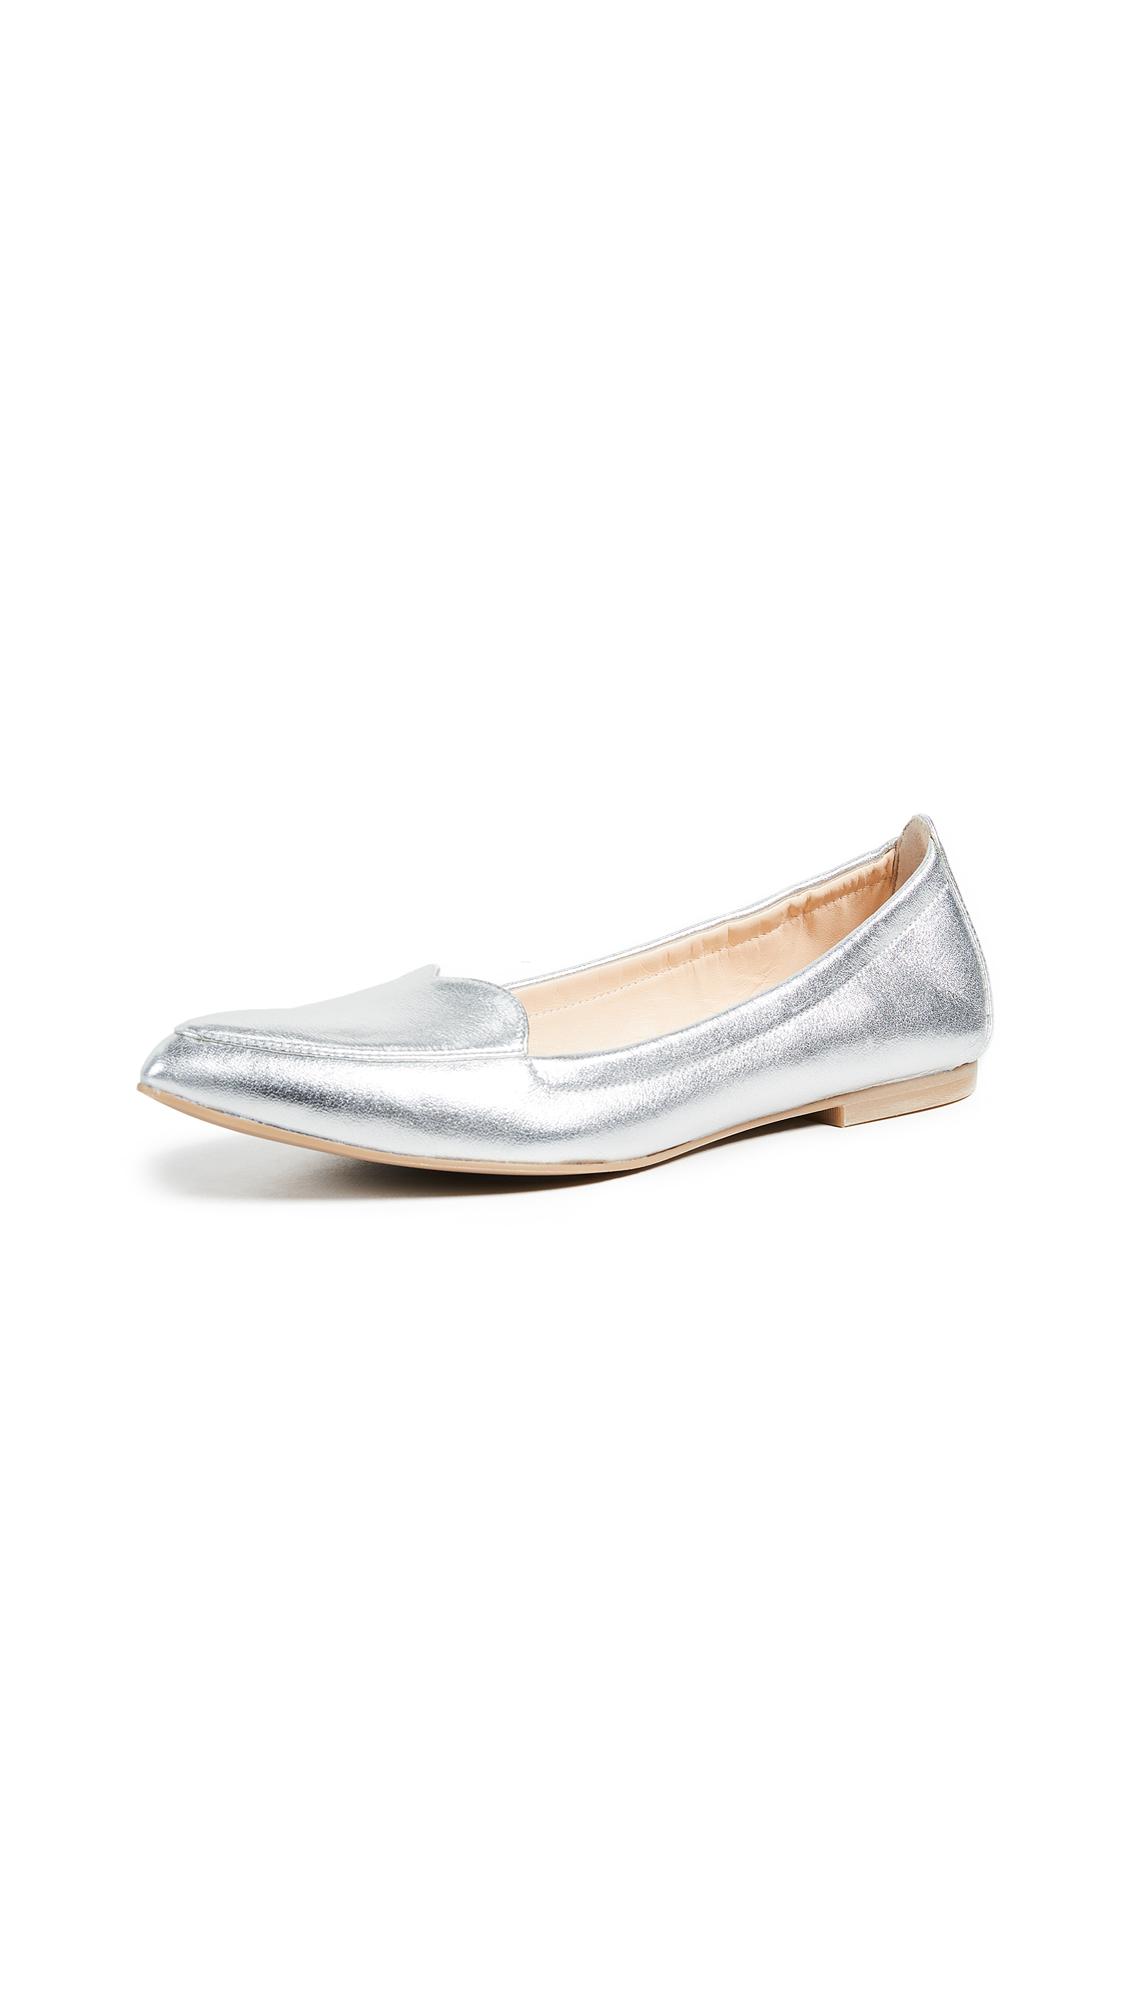 Isa Tapia Nova Flats - Silver